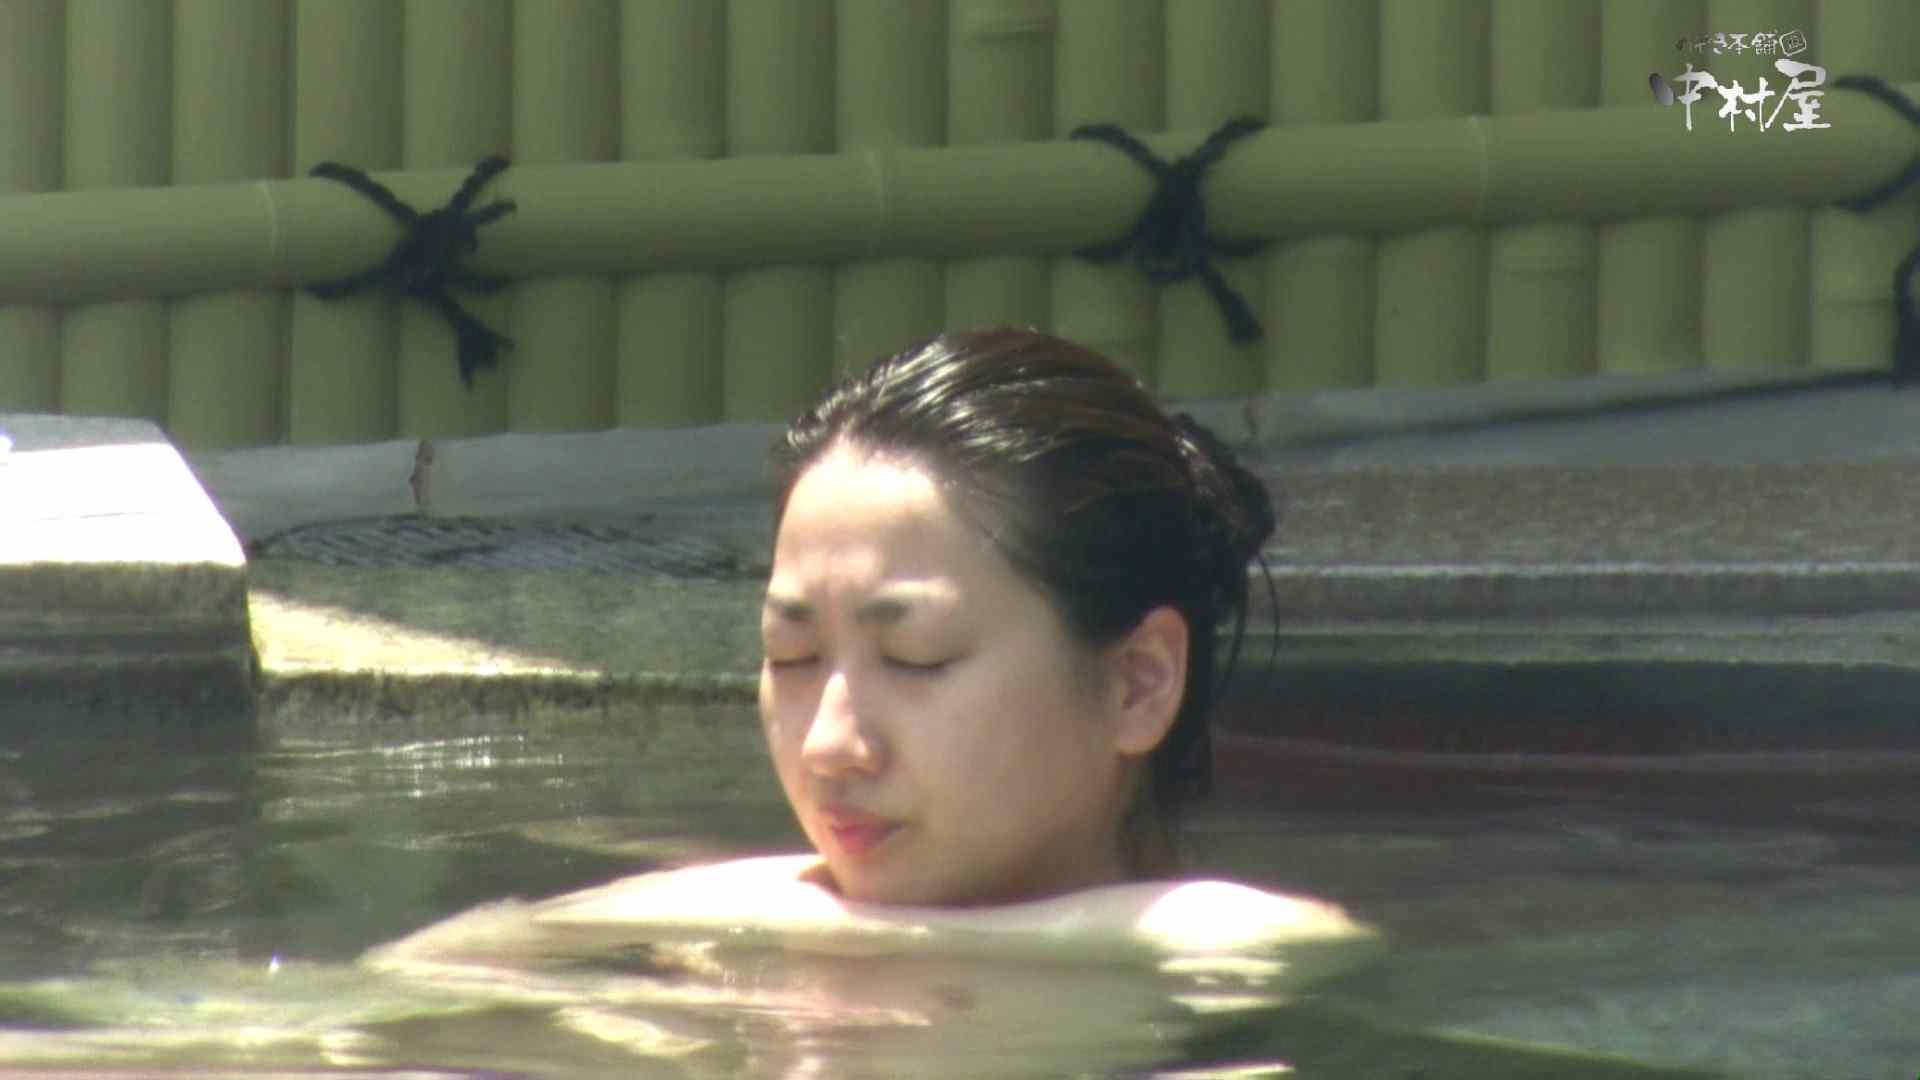 Aquaな露天風呂Vol.888 盗撮 エロ無料画像 77画像 44